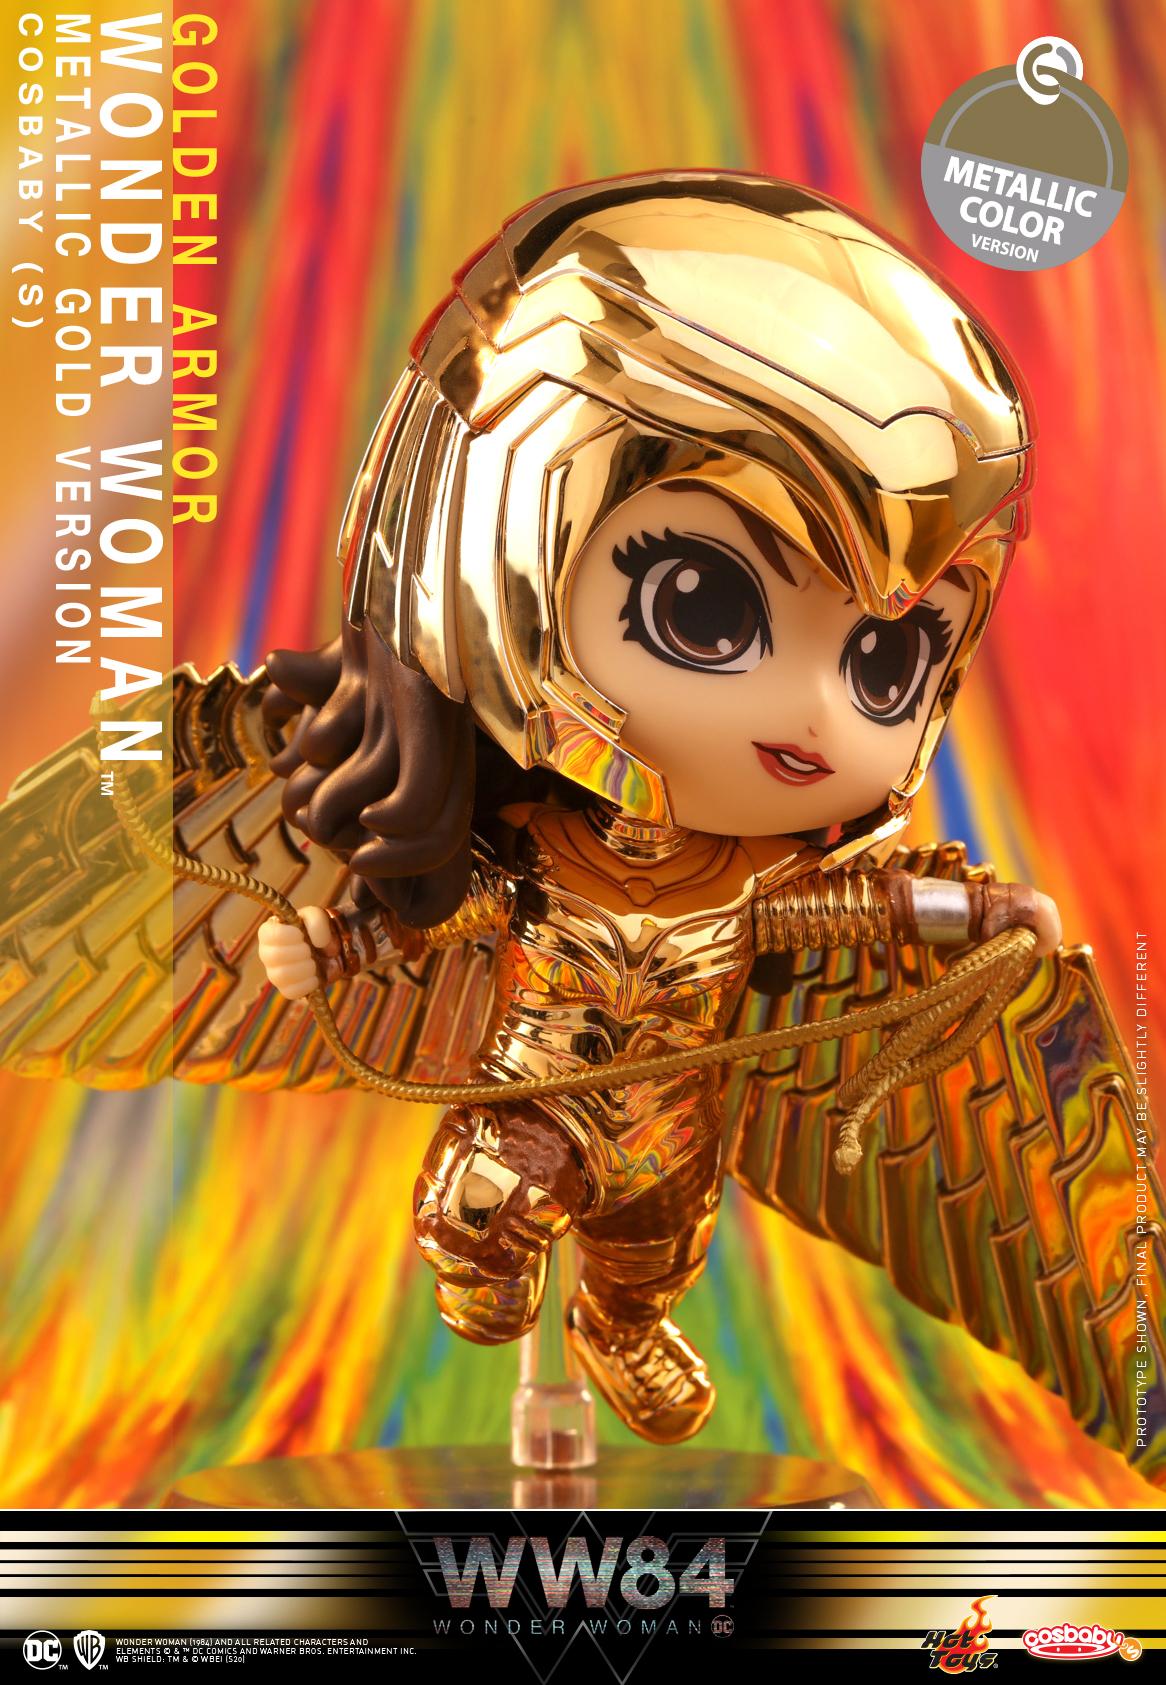 Hot Toys - WW84 - Golden Armor Wonder Woman (Metallic Colour Version) Cosbaby_PR2